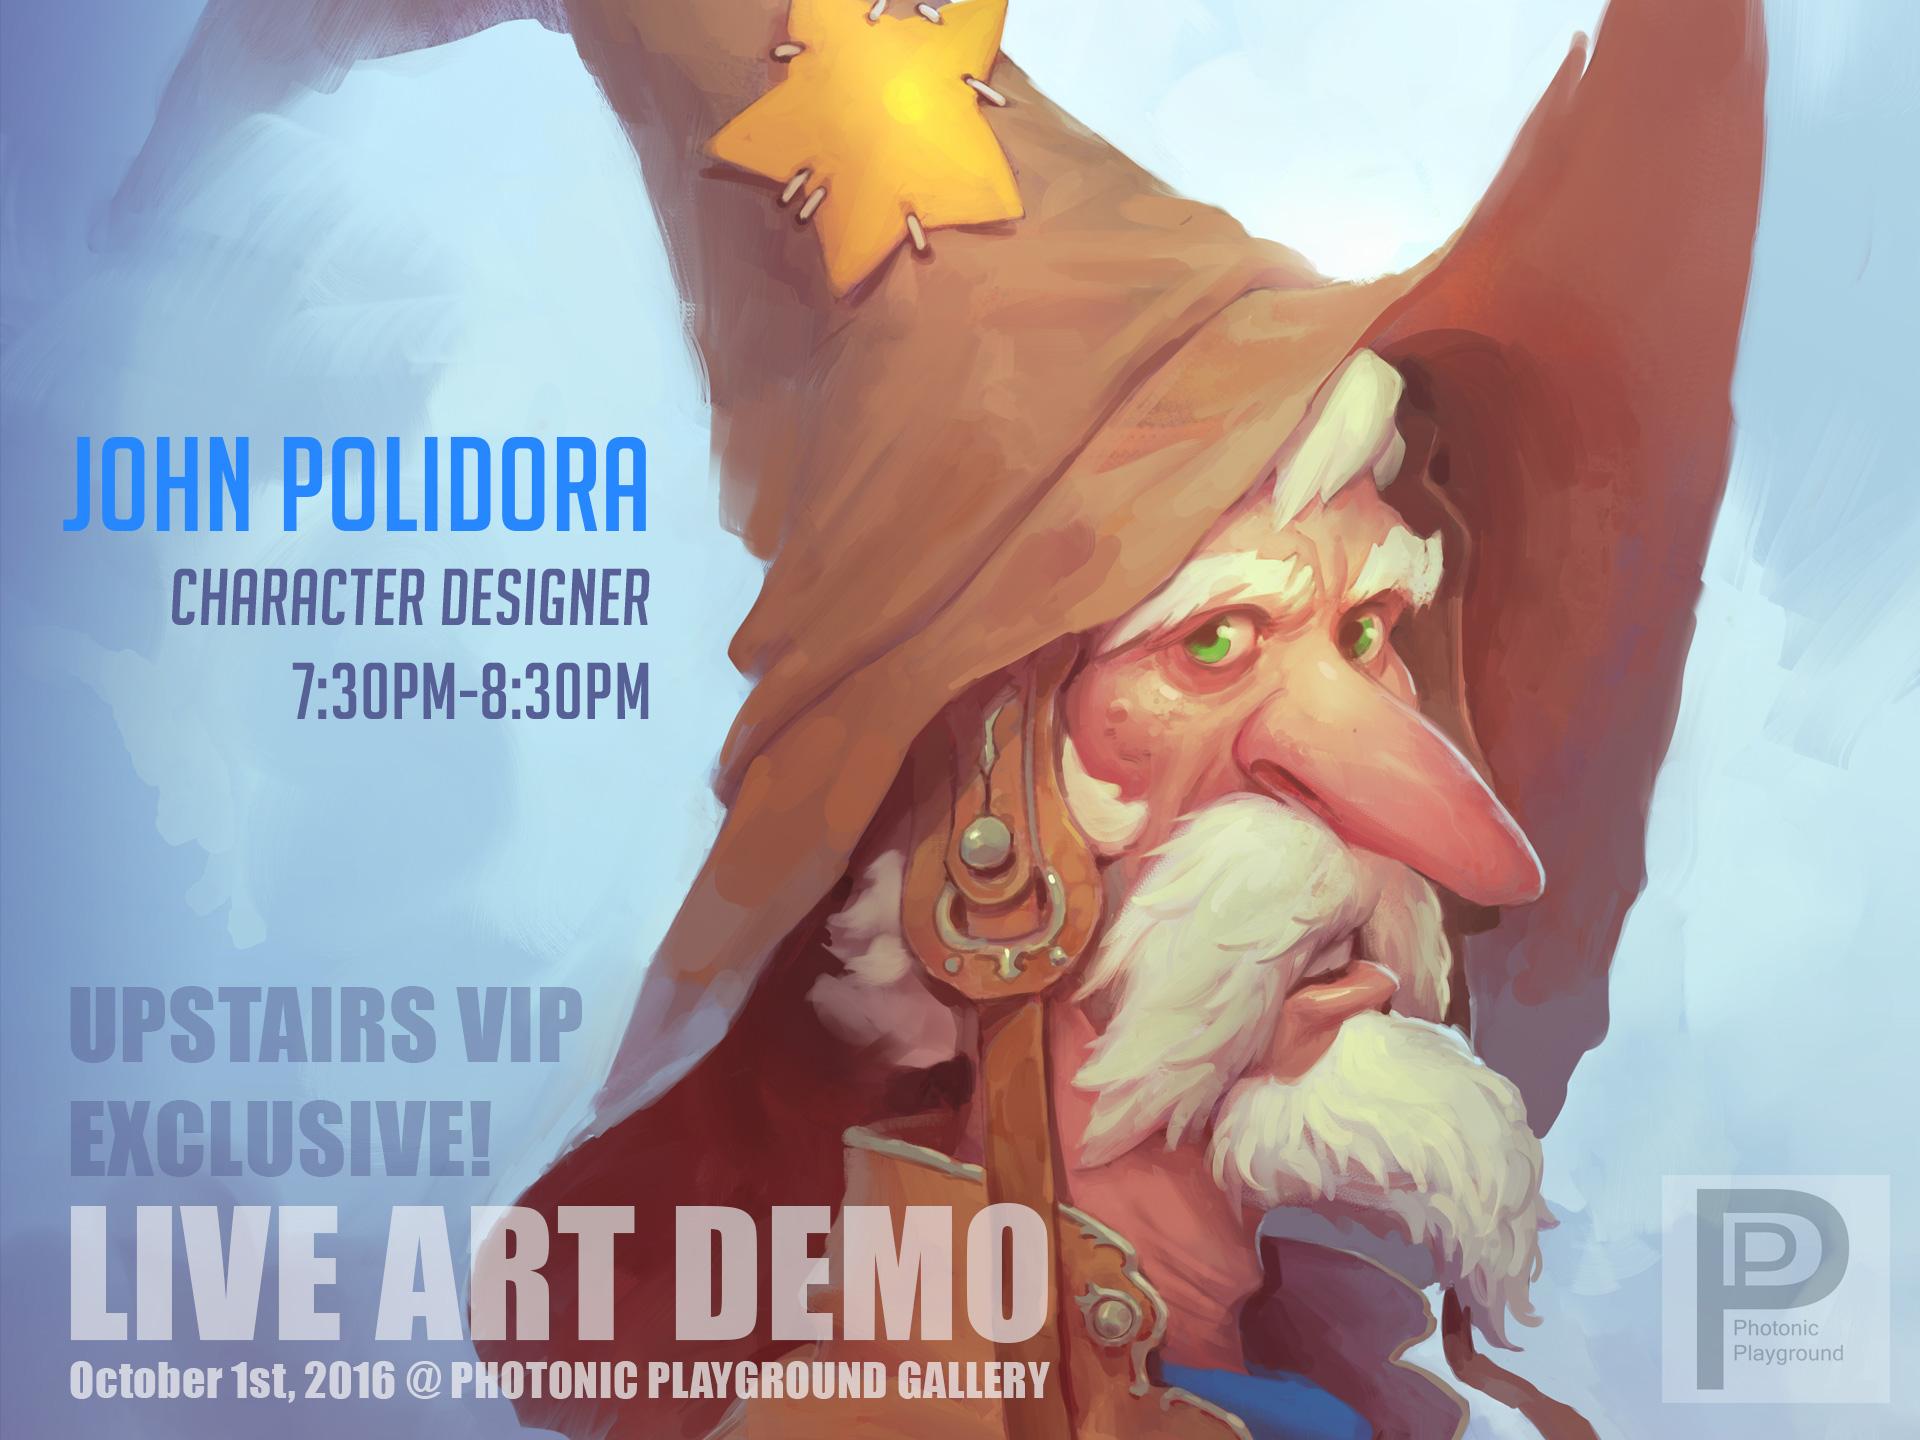 John Polidora's art demo poster for the October 2016 show.